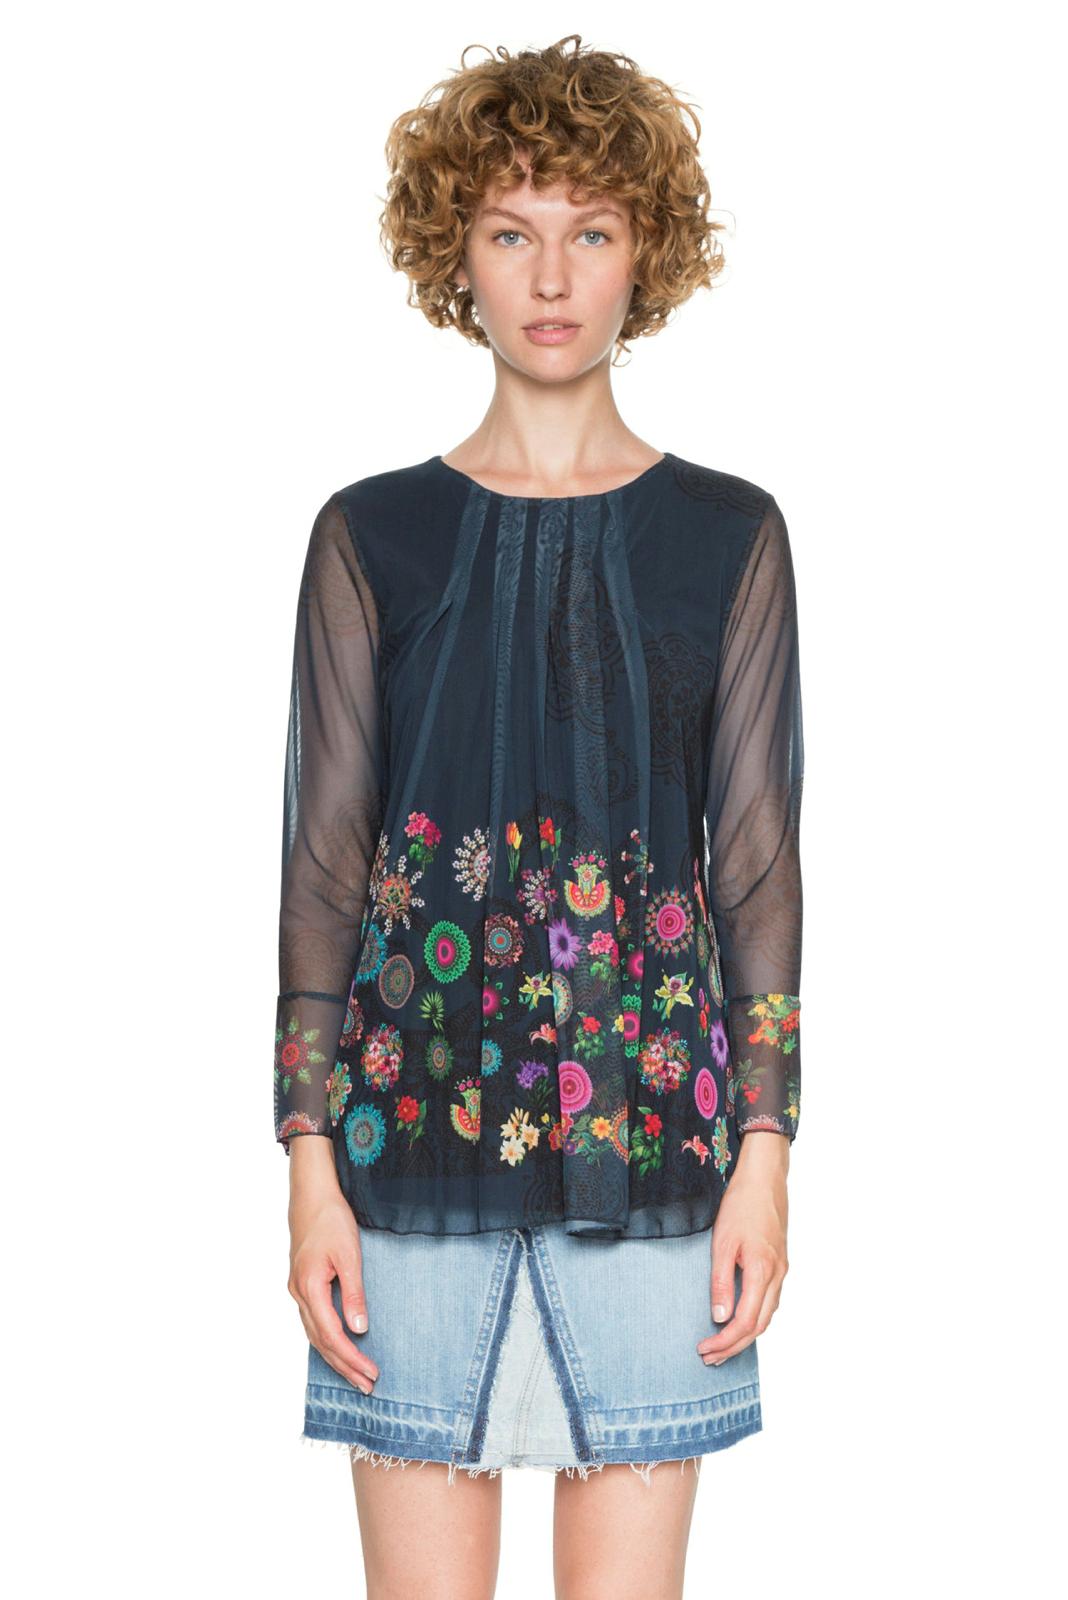 Desigual Black Chruse Chiffon Long Sleeved Top Floral Mandala XS-XXL 8-18 RP?74